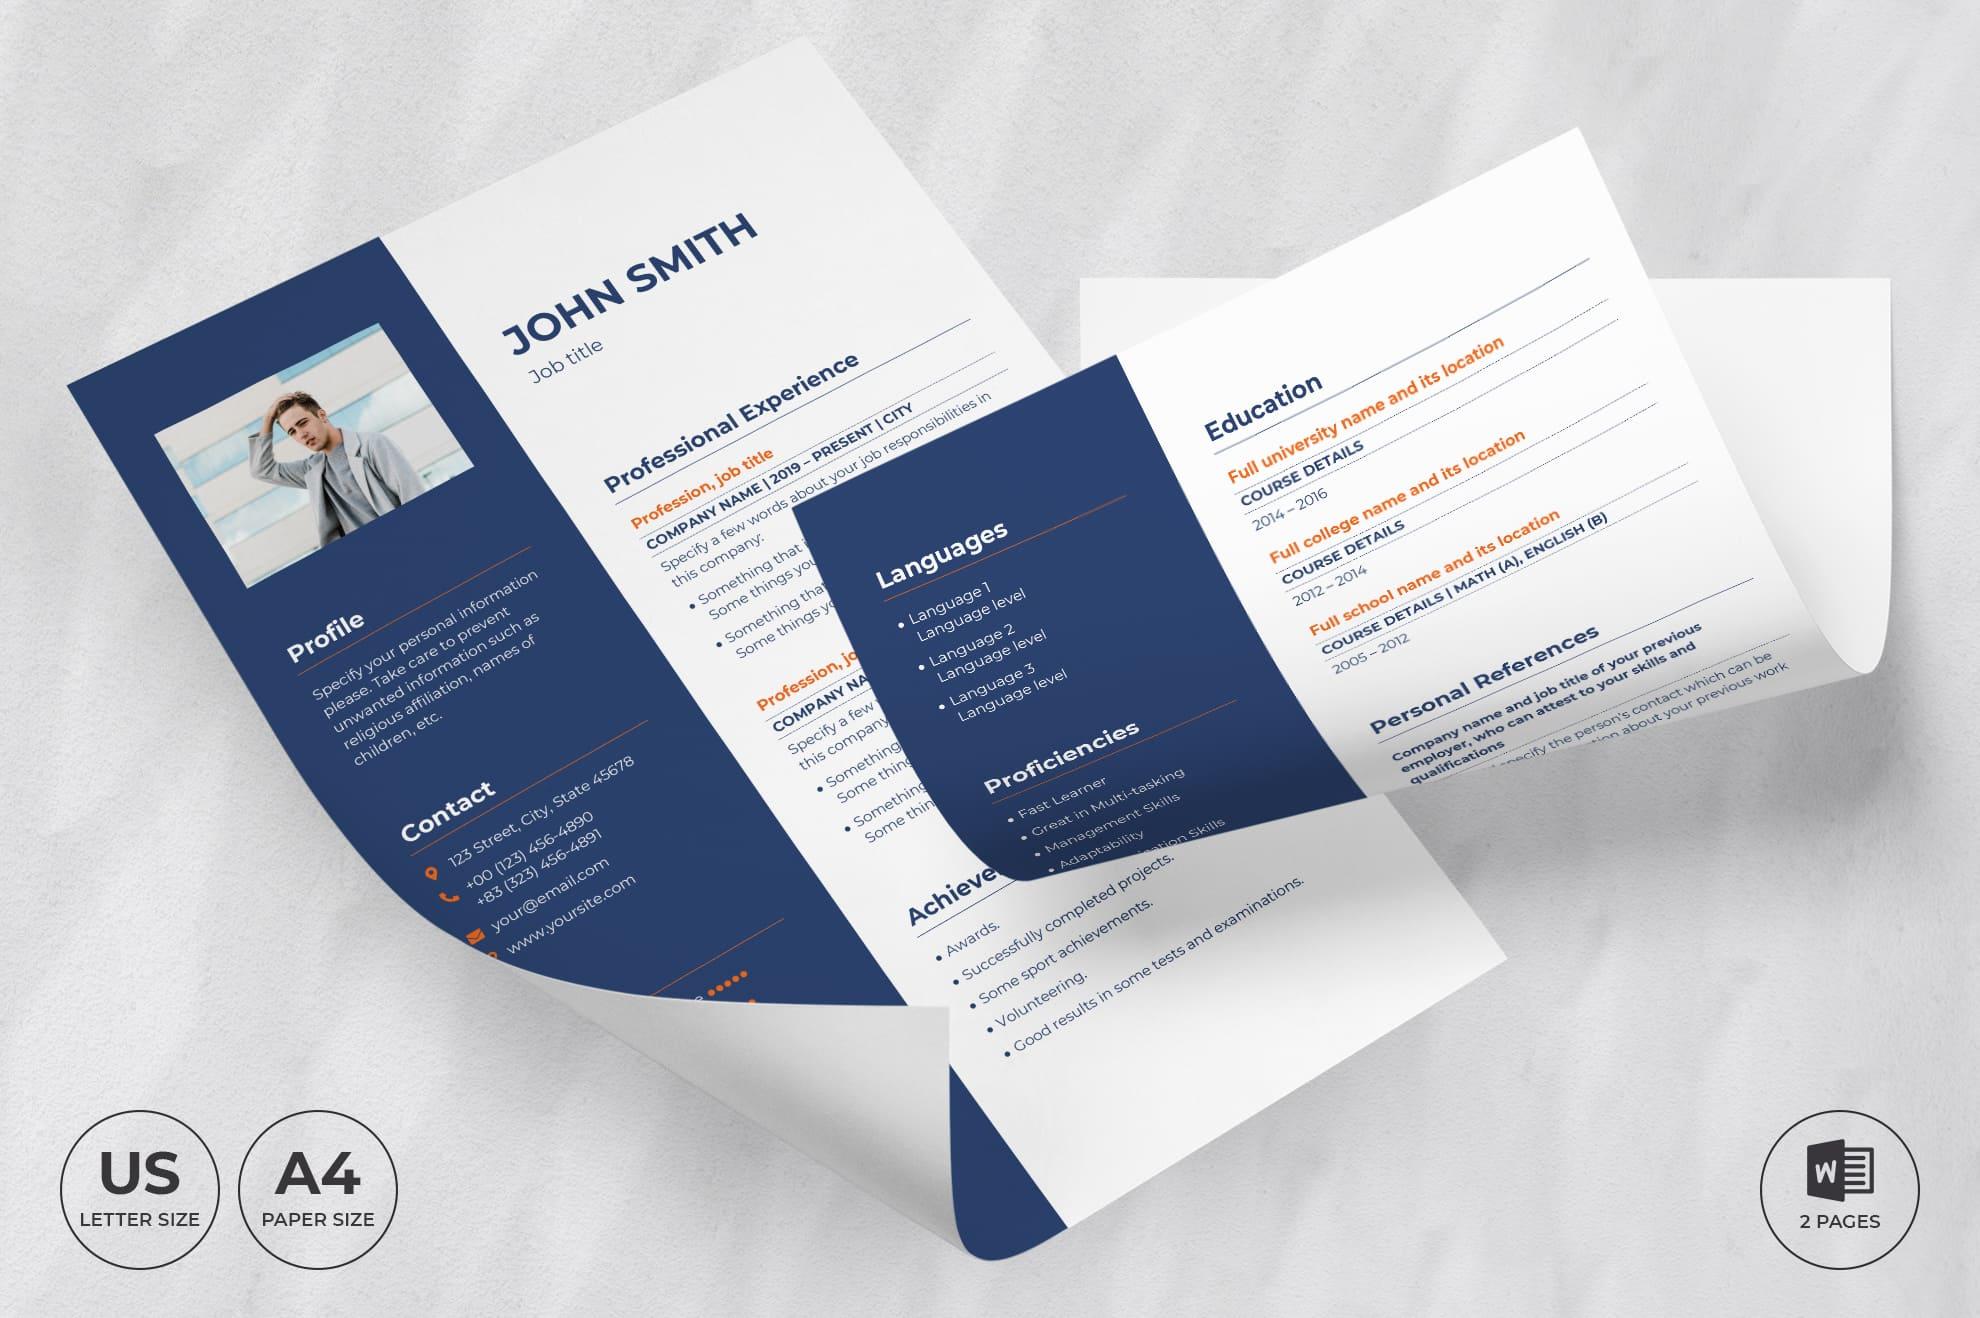 Marketing Agency CV Resume Template.